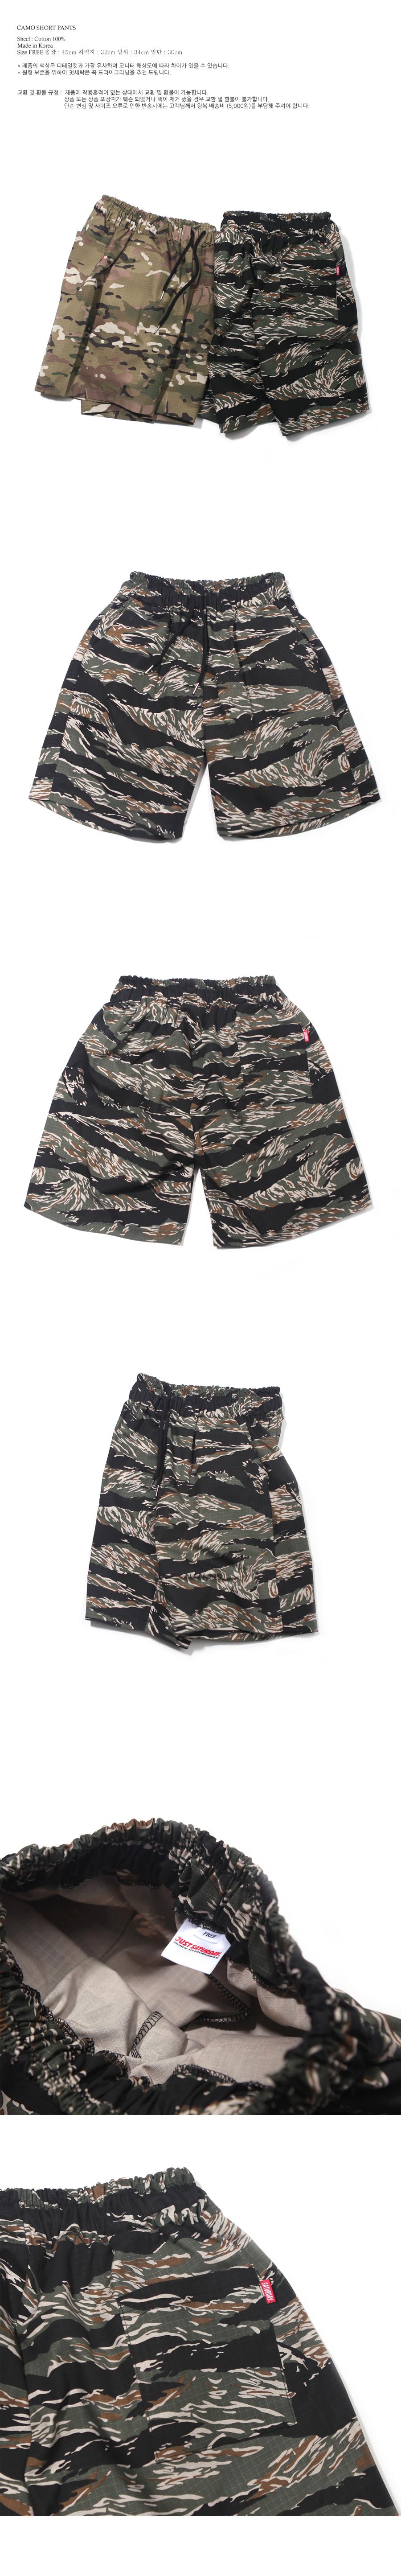 TIGER CAMO SHORT PANTS BLACK - 저스트세러데이, 32,000원, 하의, 숏/하프팬츠